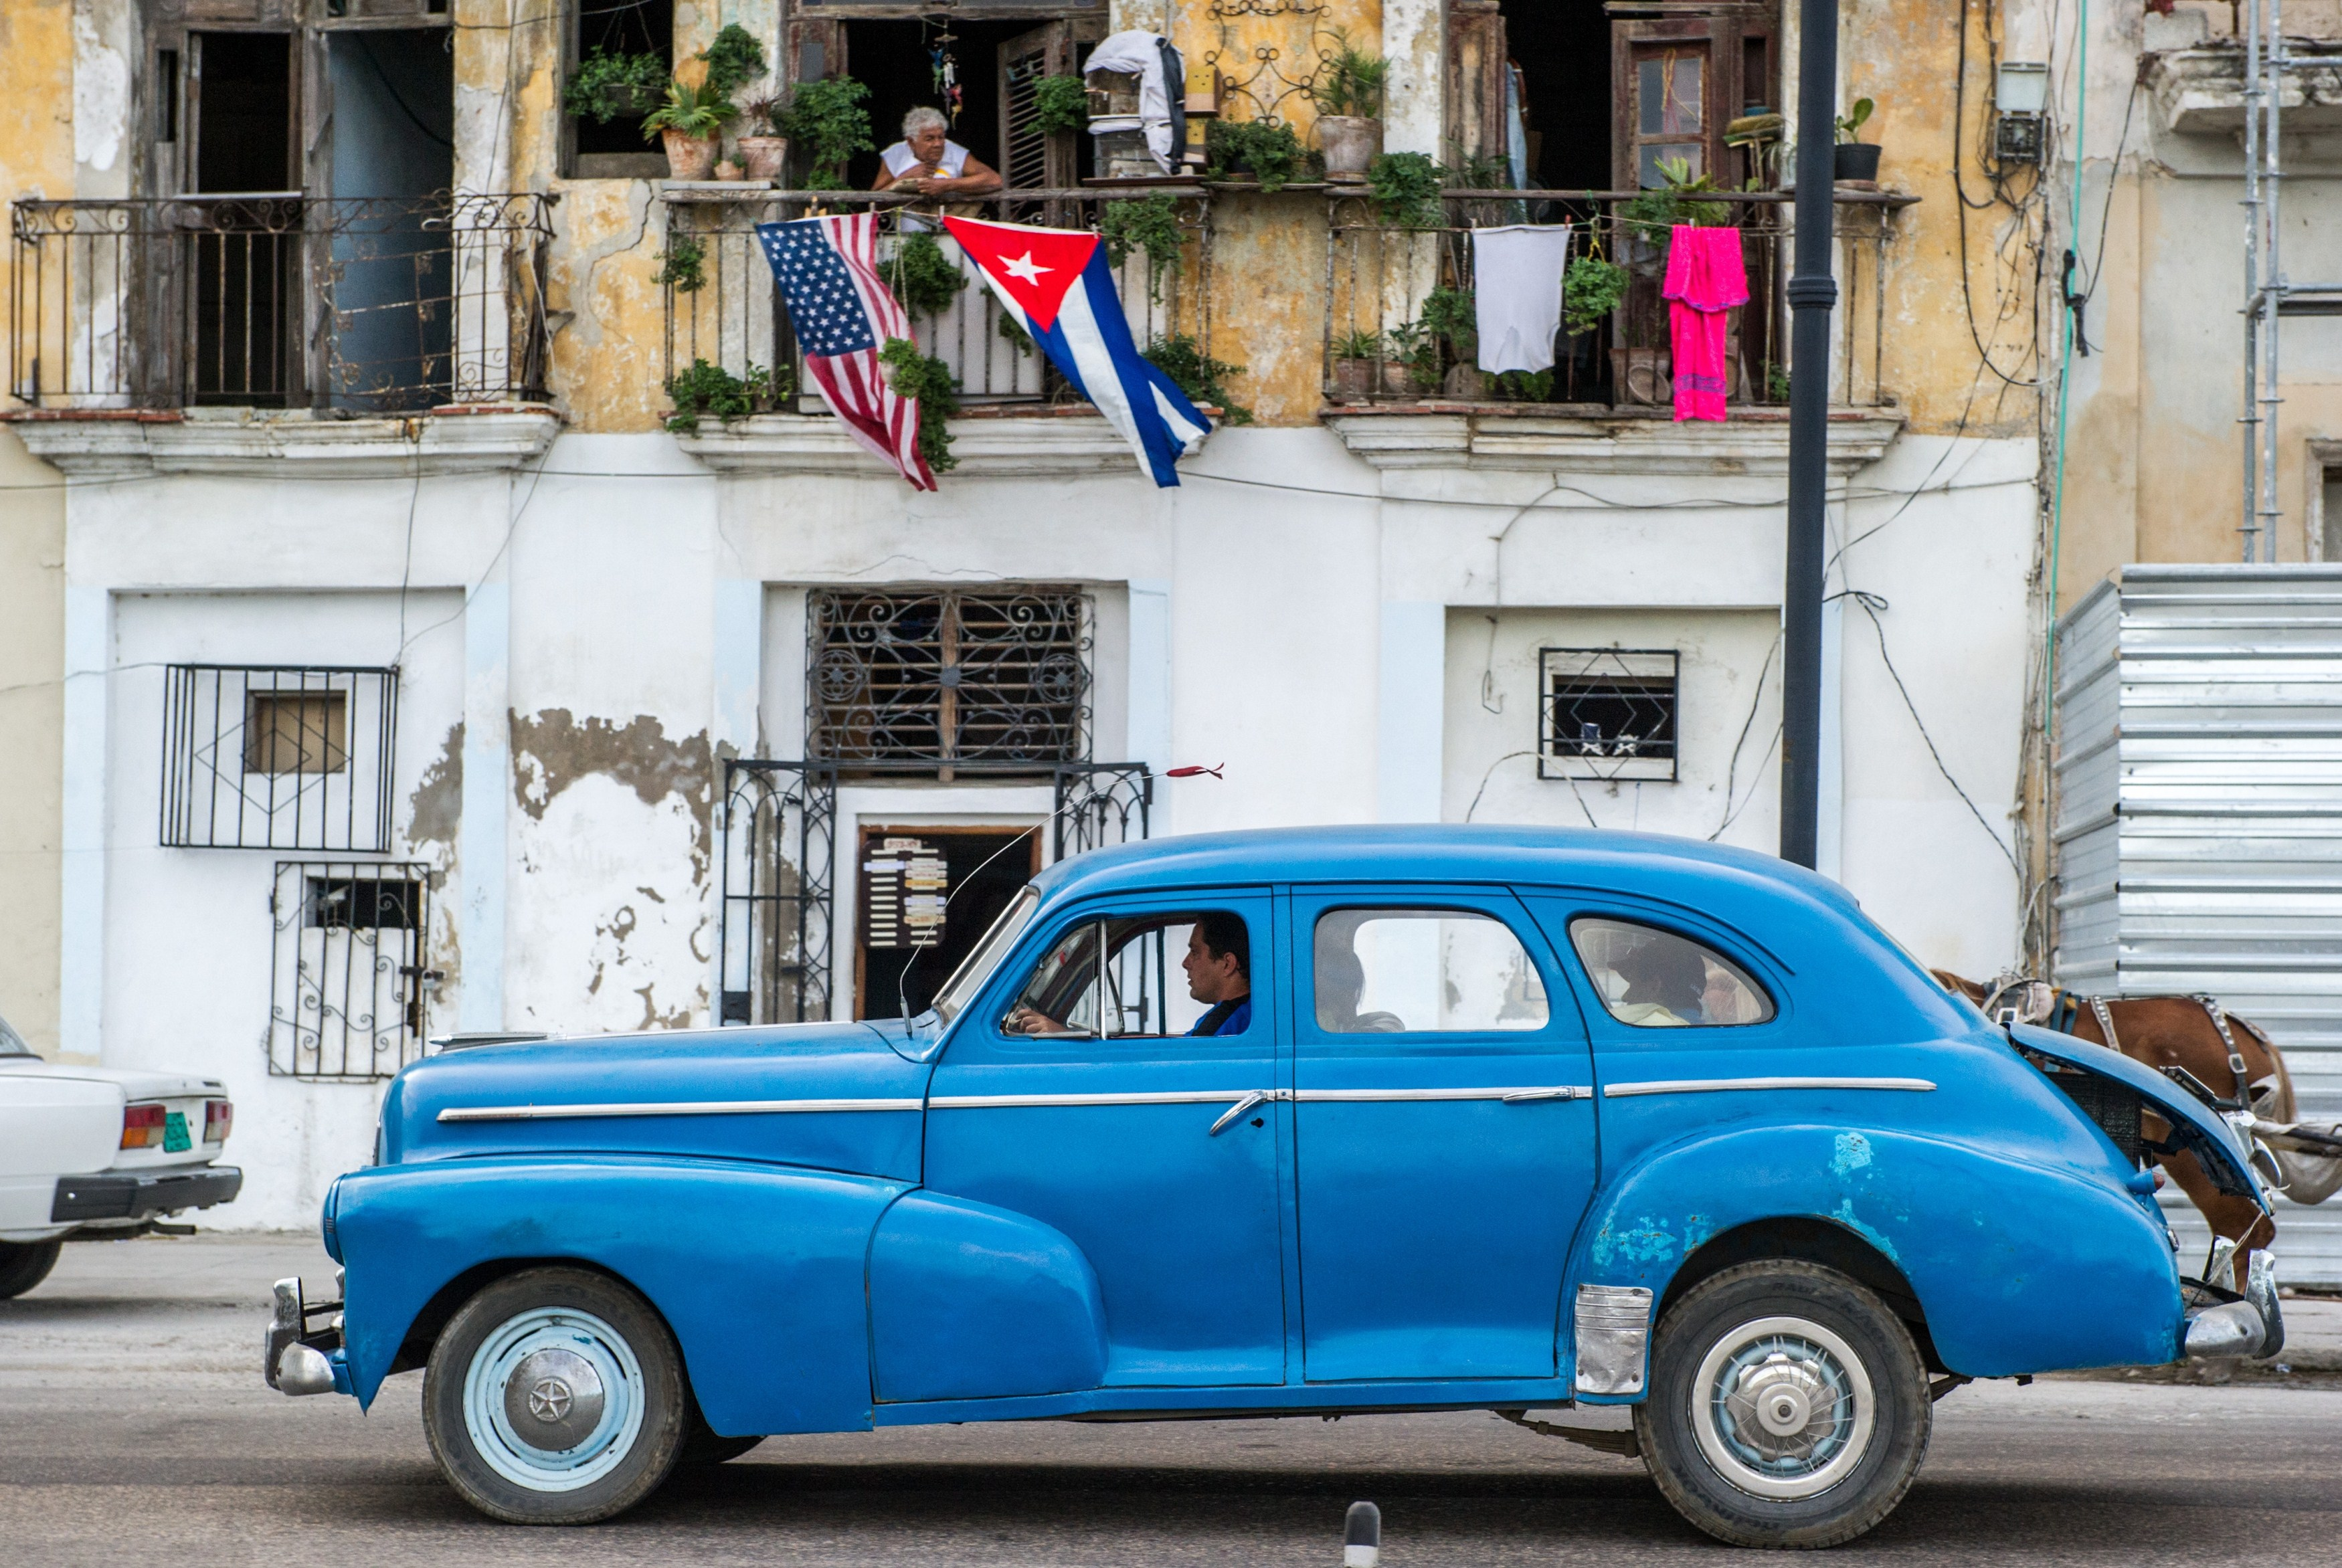 CUBA-OLD AMERICAN CARS